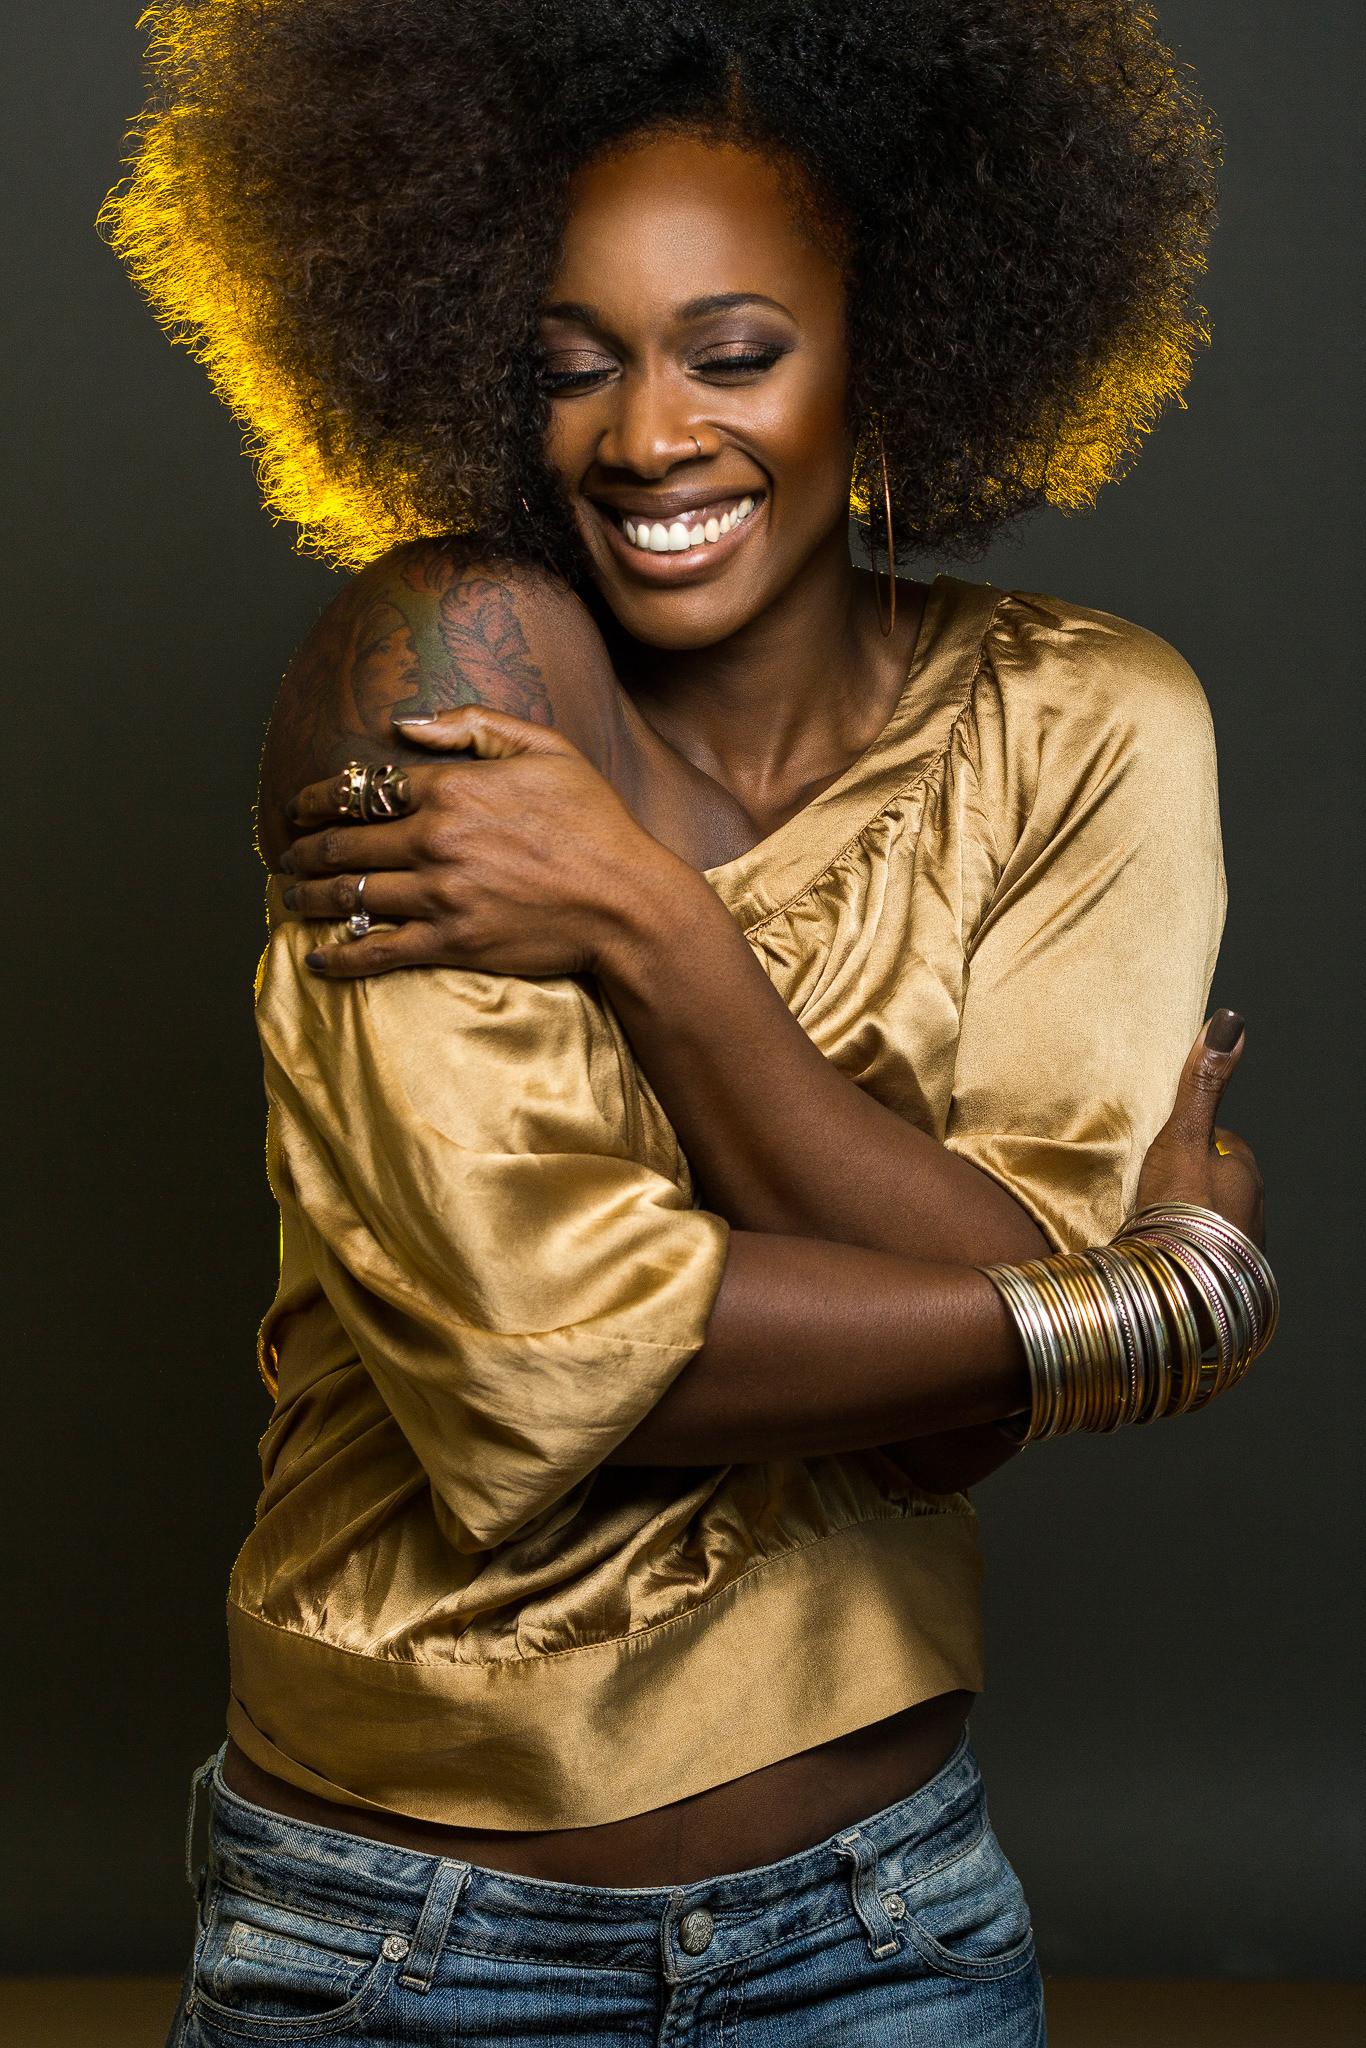 Keisha-McLeggon-portrait-3-photo-by-Kevin-Patrick-Robbins-web.jpg